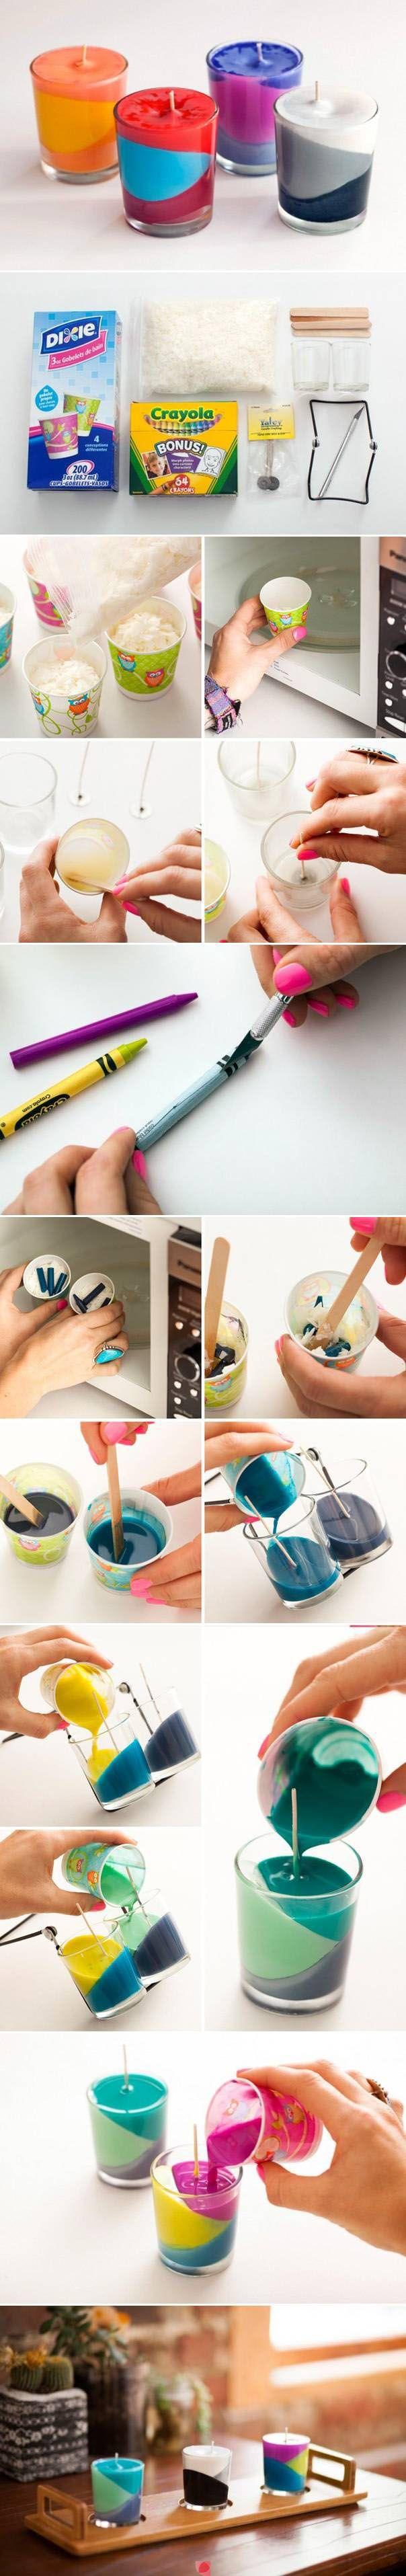 DIY Colorful Candles | DIY Creative Ideas